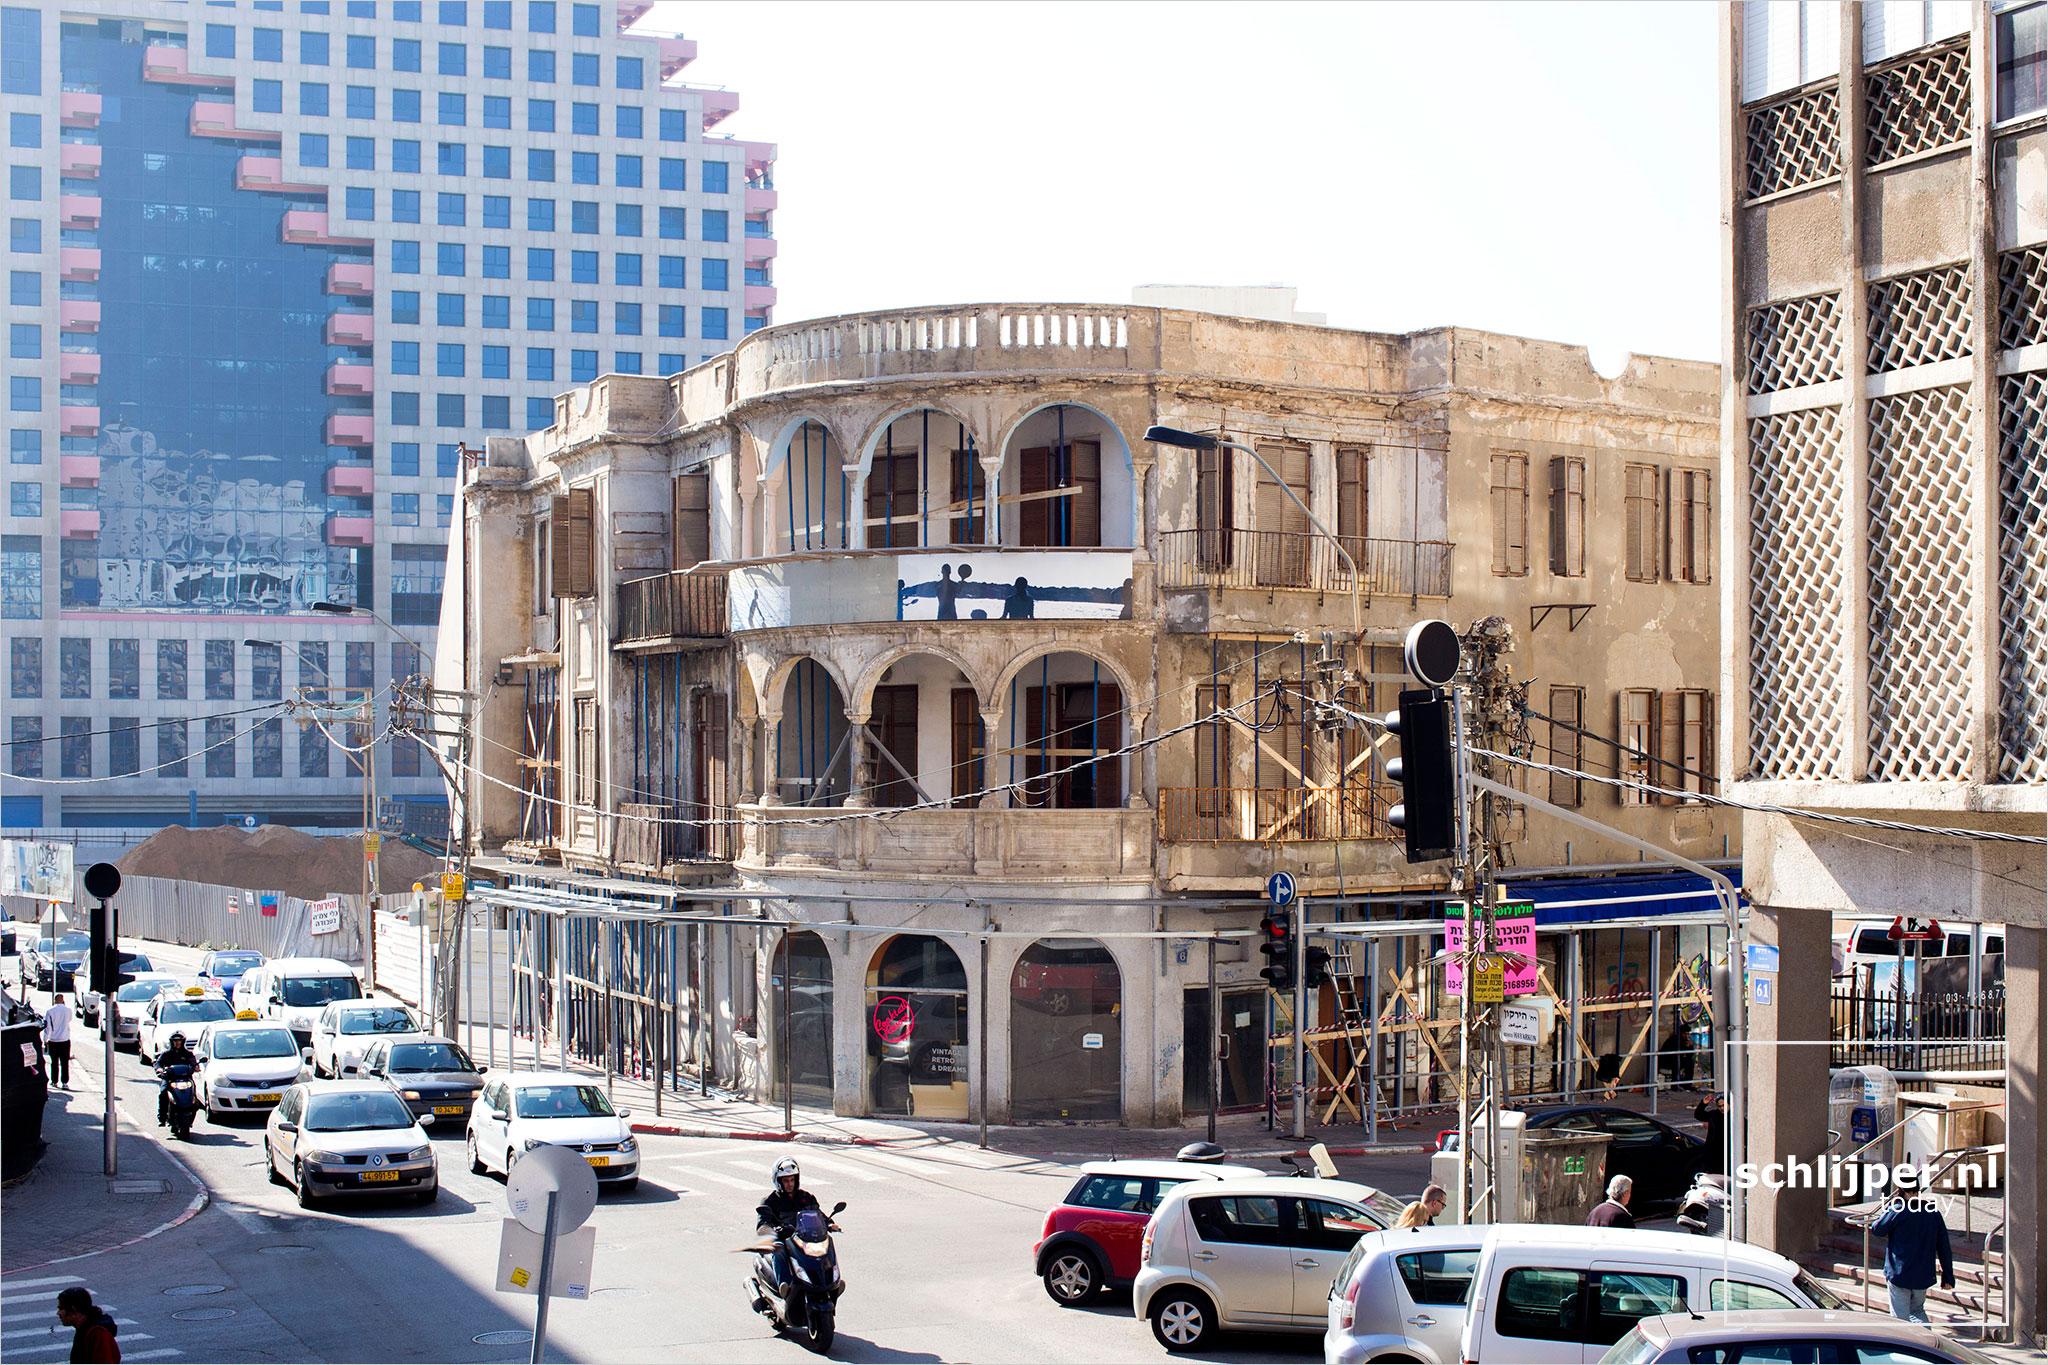 Israel, Tel Aviv, 2 januari 2014